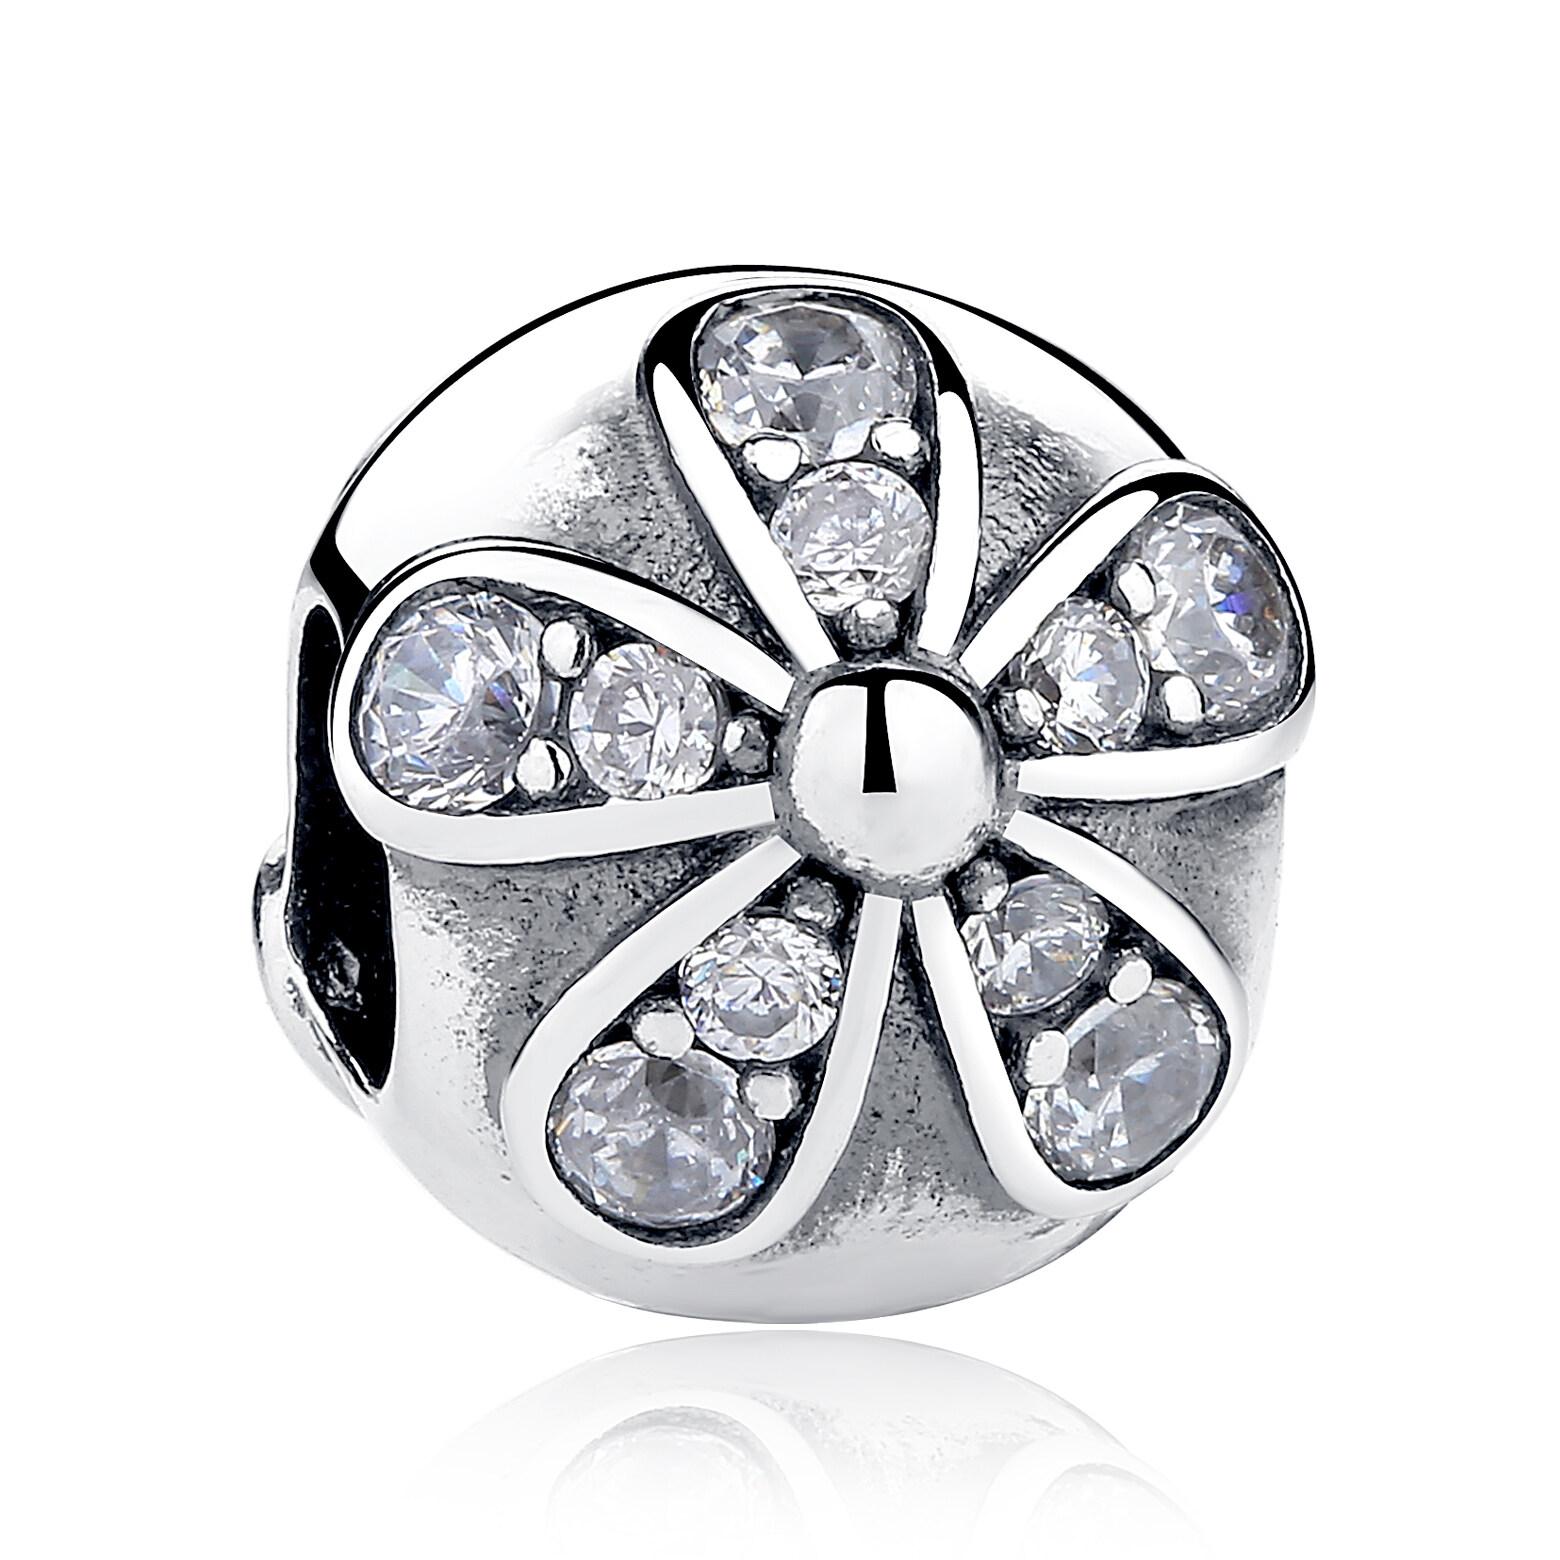 Jual 925 Sterling Silver Menyilaukan Daisy Charm Fit Gelang Kalung Sterling Silver Aksesoris Perhiasan Pas188 Bamoer Branded